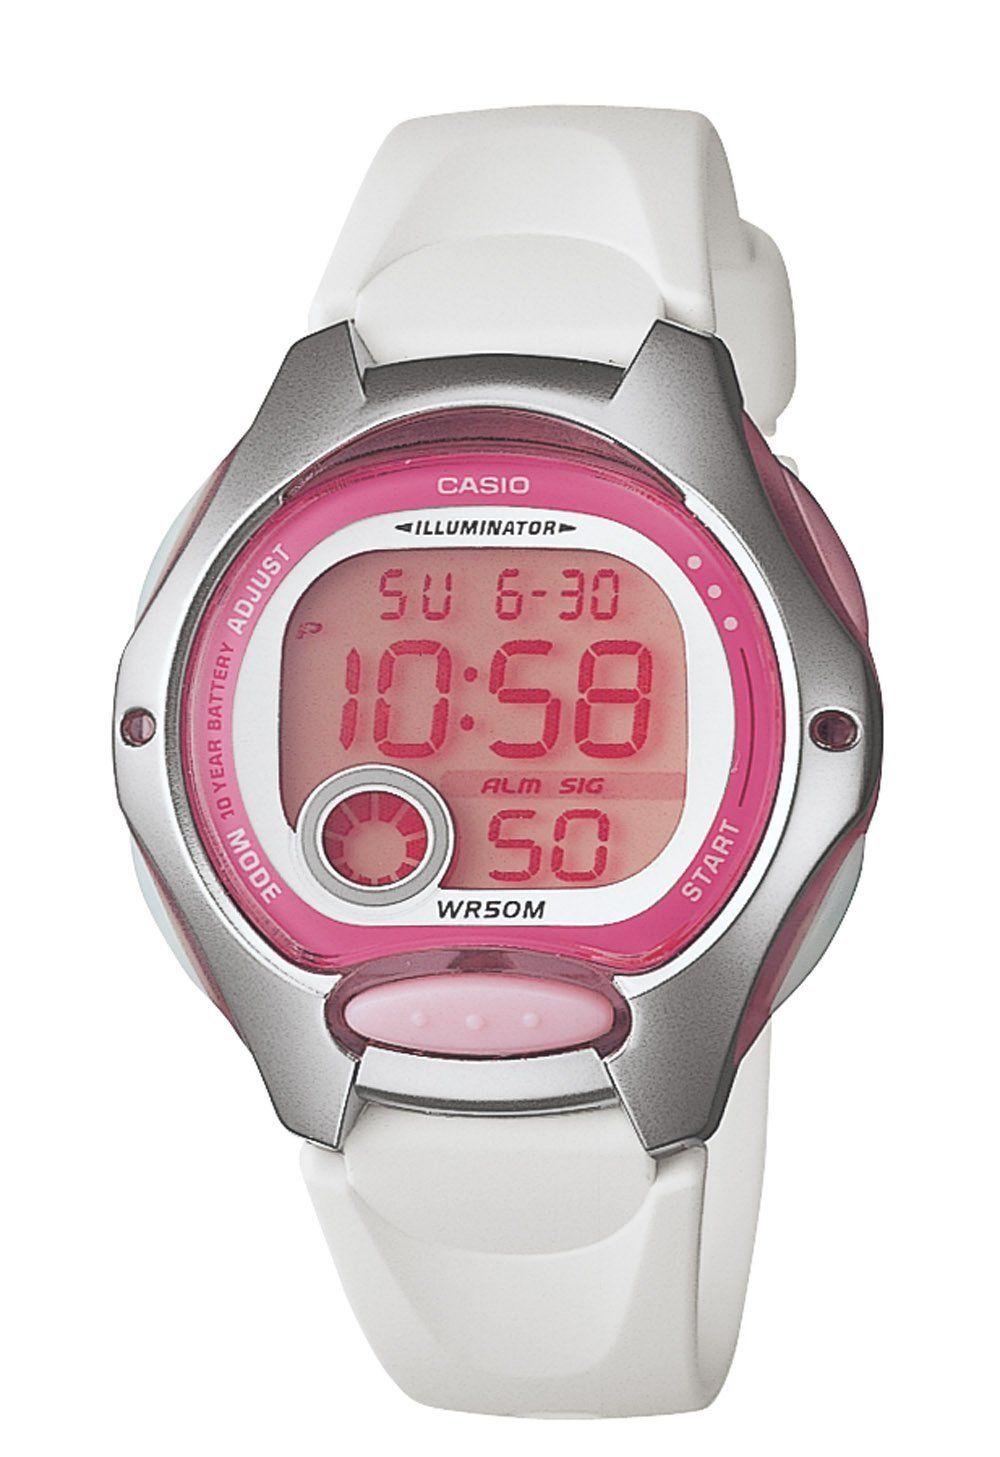 fba938391 Casio Women's LW200-7AV Digital White Resin Strap Watch Price: $17.47